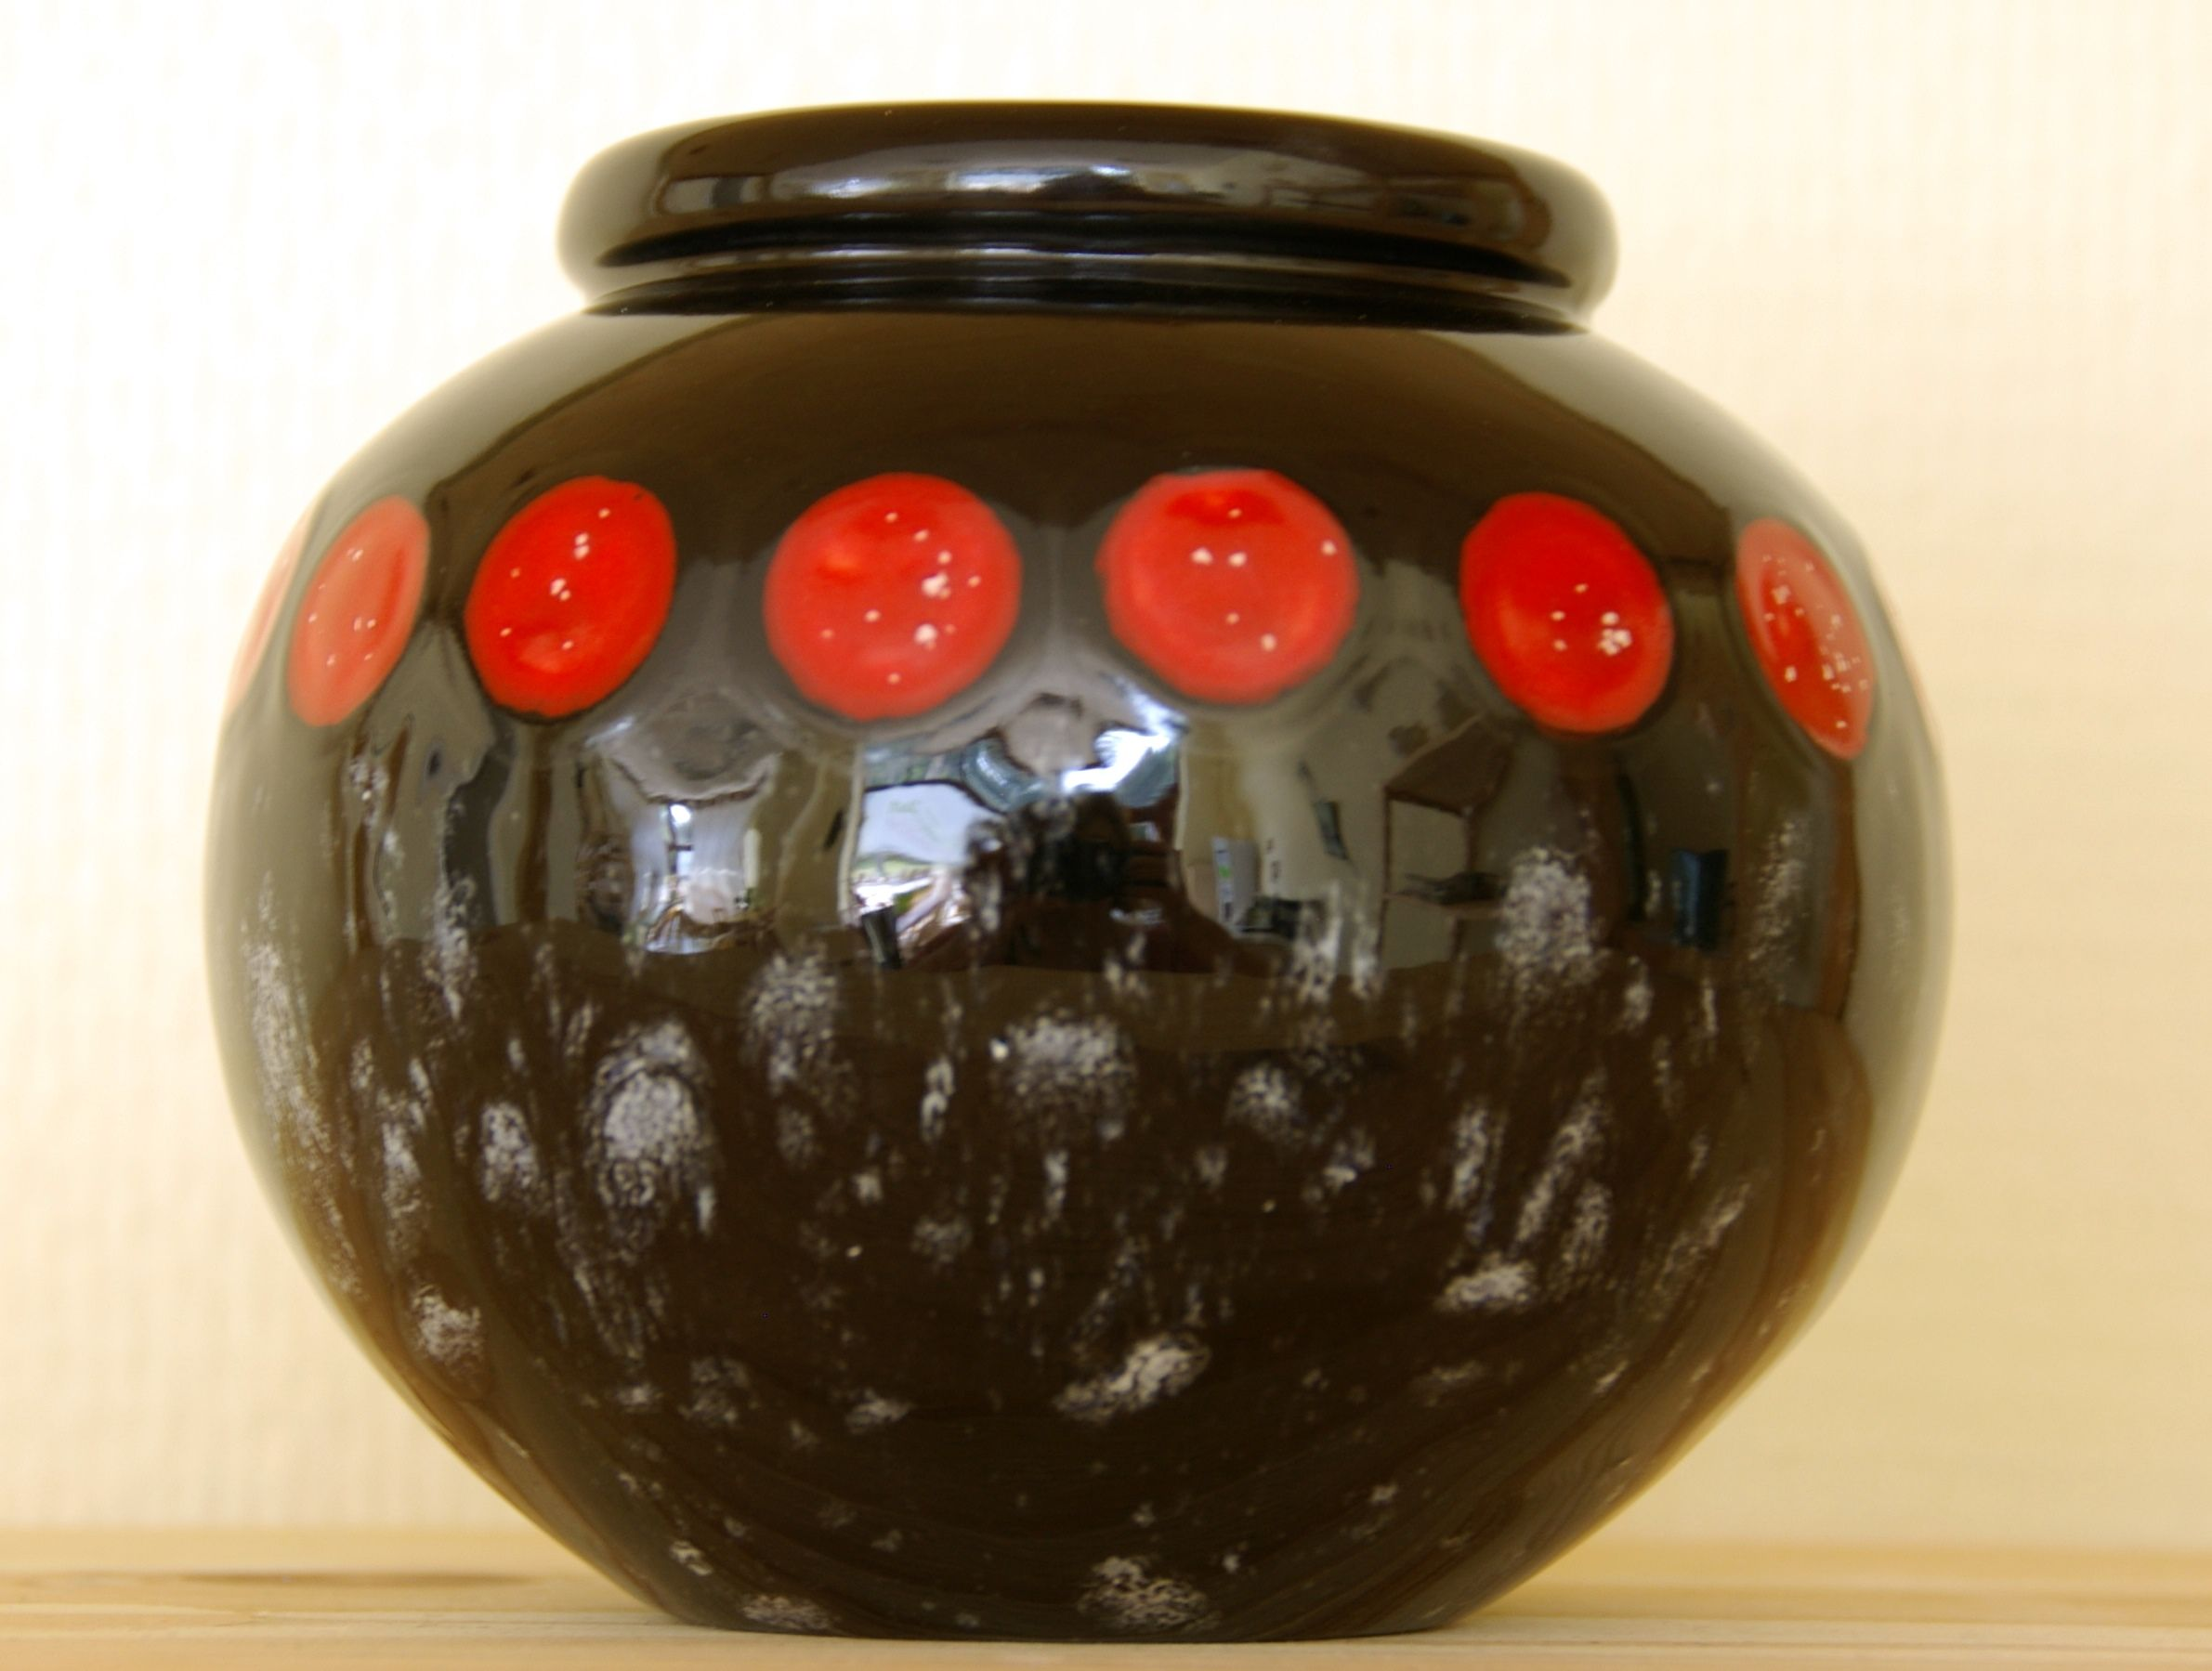 bemalte keramik kugelvase mal 39 s an dresden selbstgemachtes pinterest keramik keramik. Black Bedroom Furniture Sets. Home Design Ideas